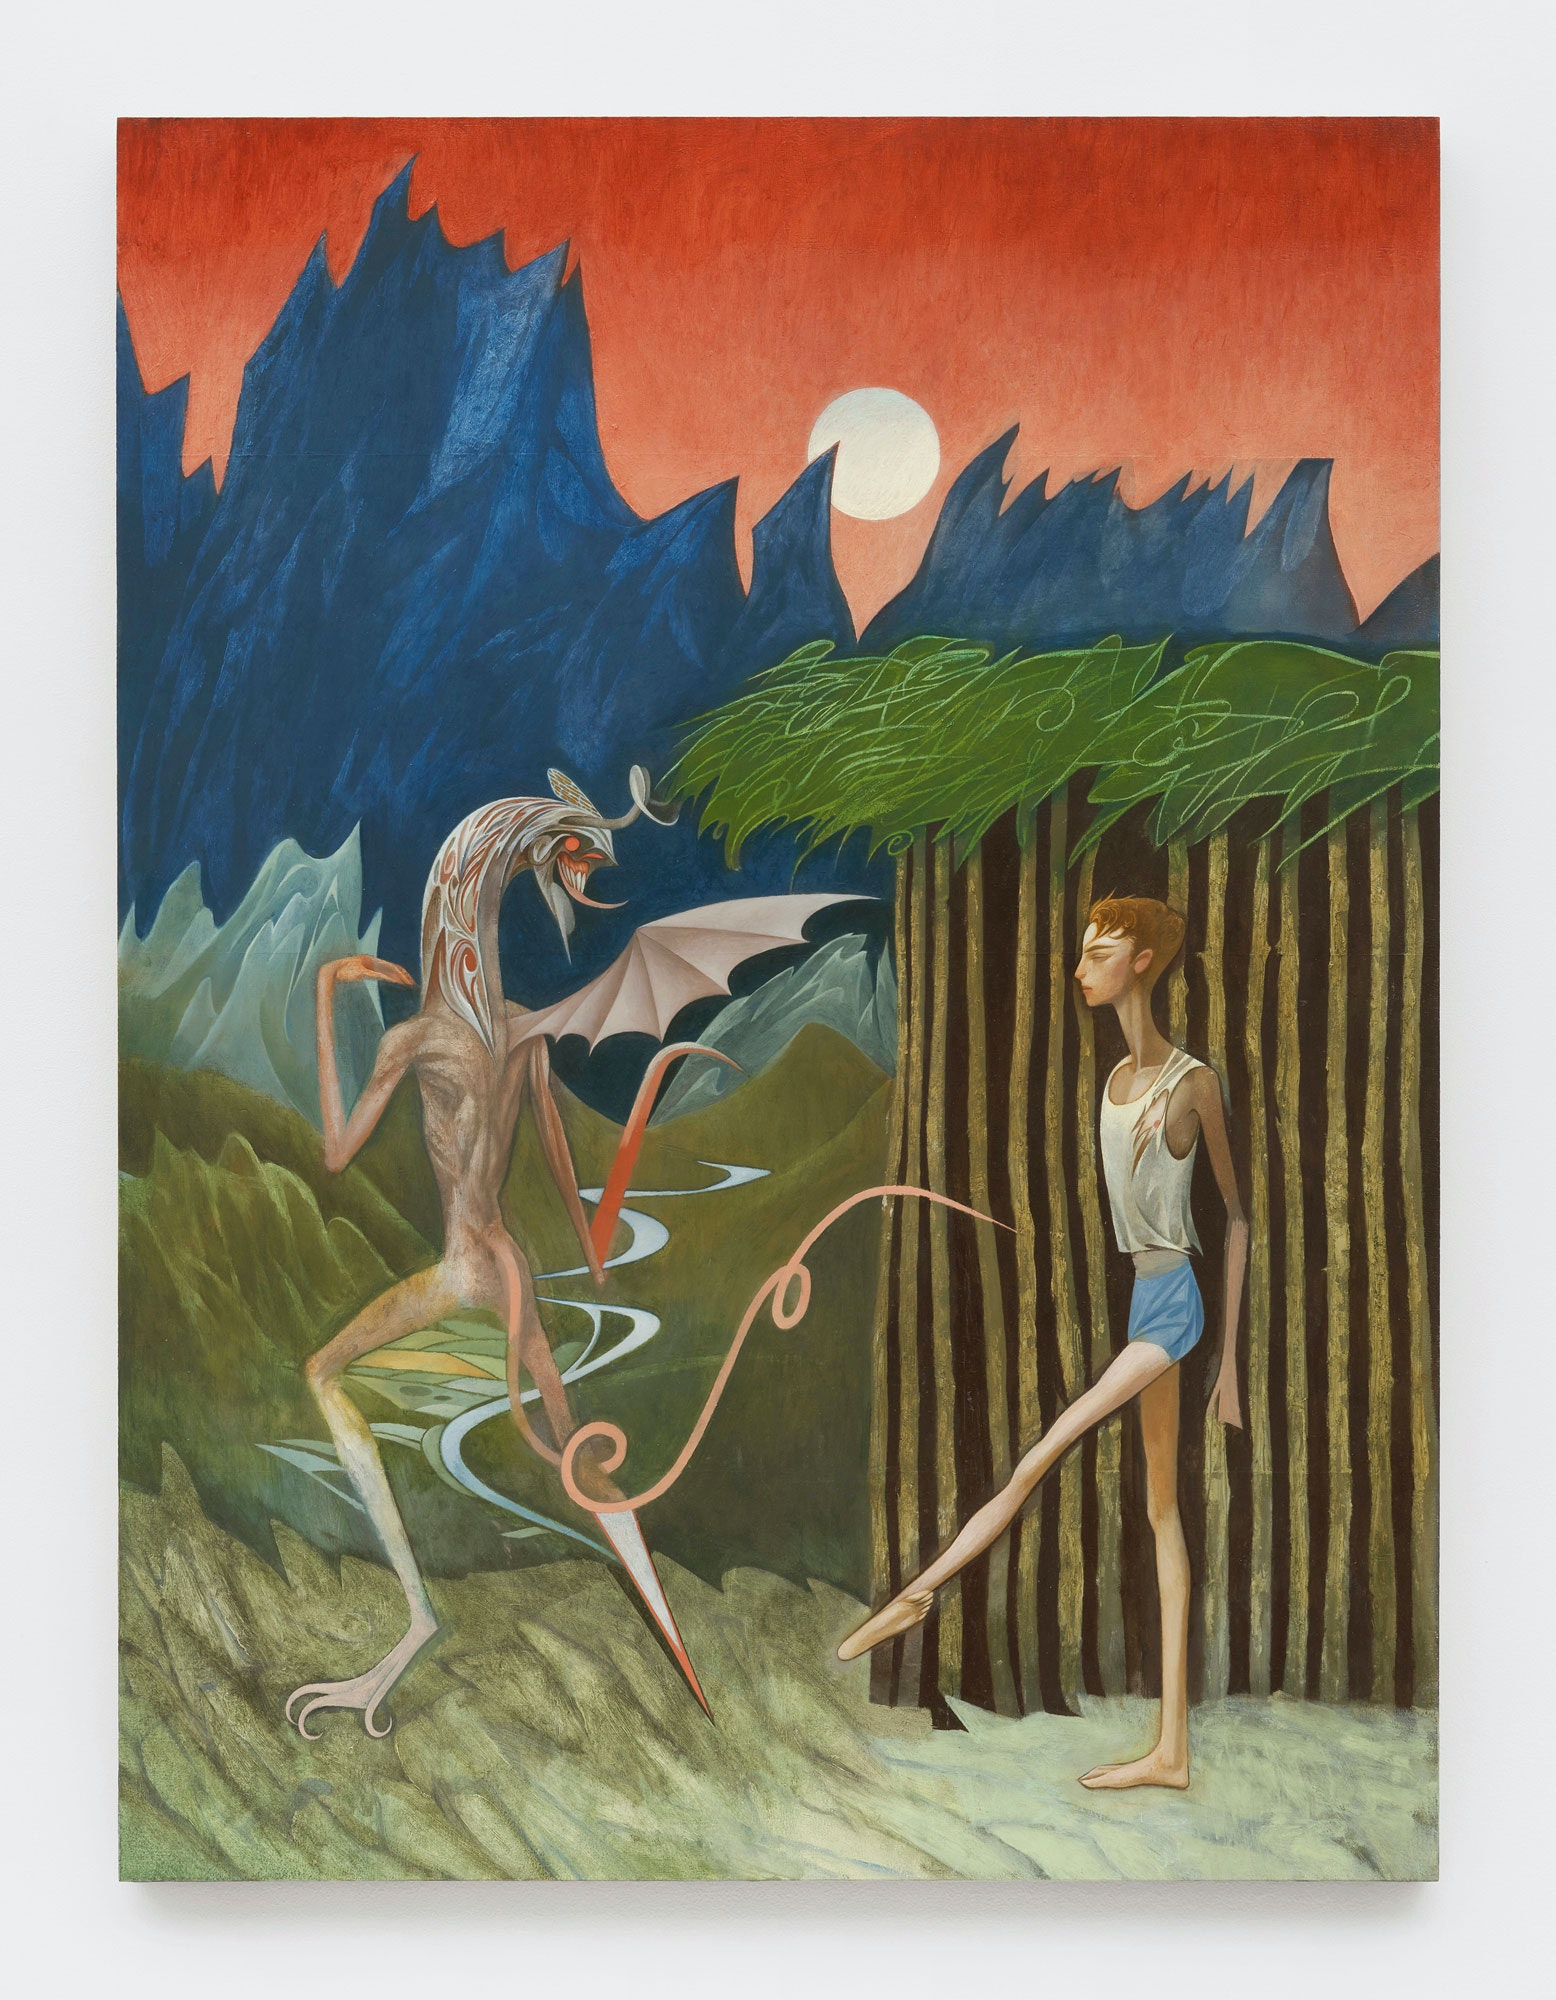 Julien Nguyen, <em>The Temptation of Christ</em>, 2020. Oil on panel, 40 x 30 inches. Courtesy Matthew Marks, New York.